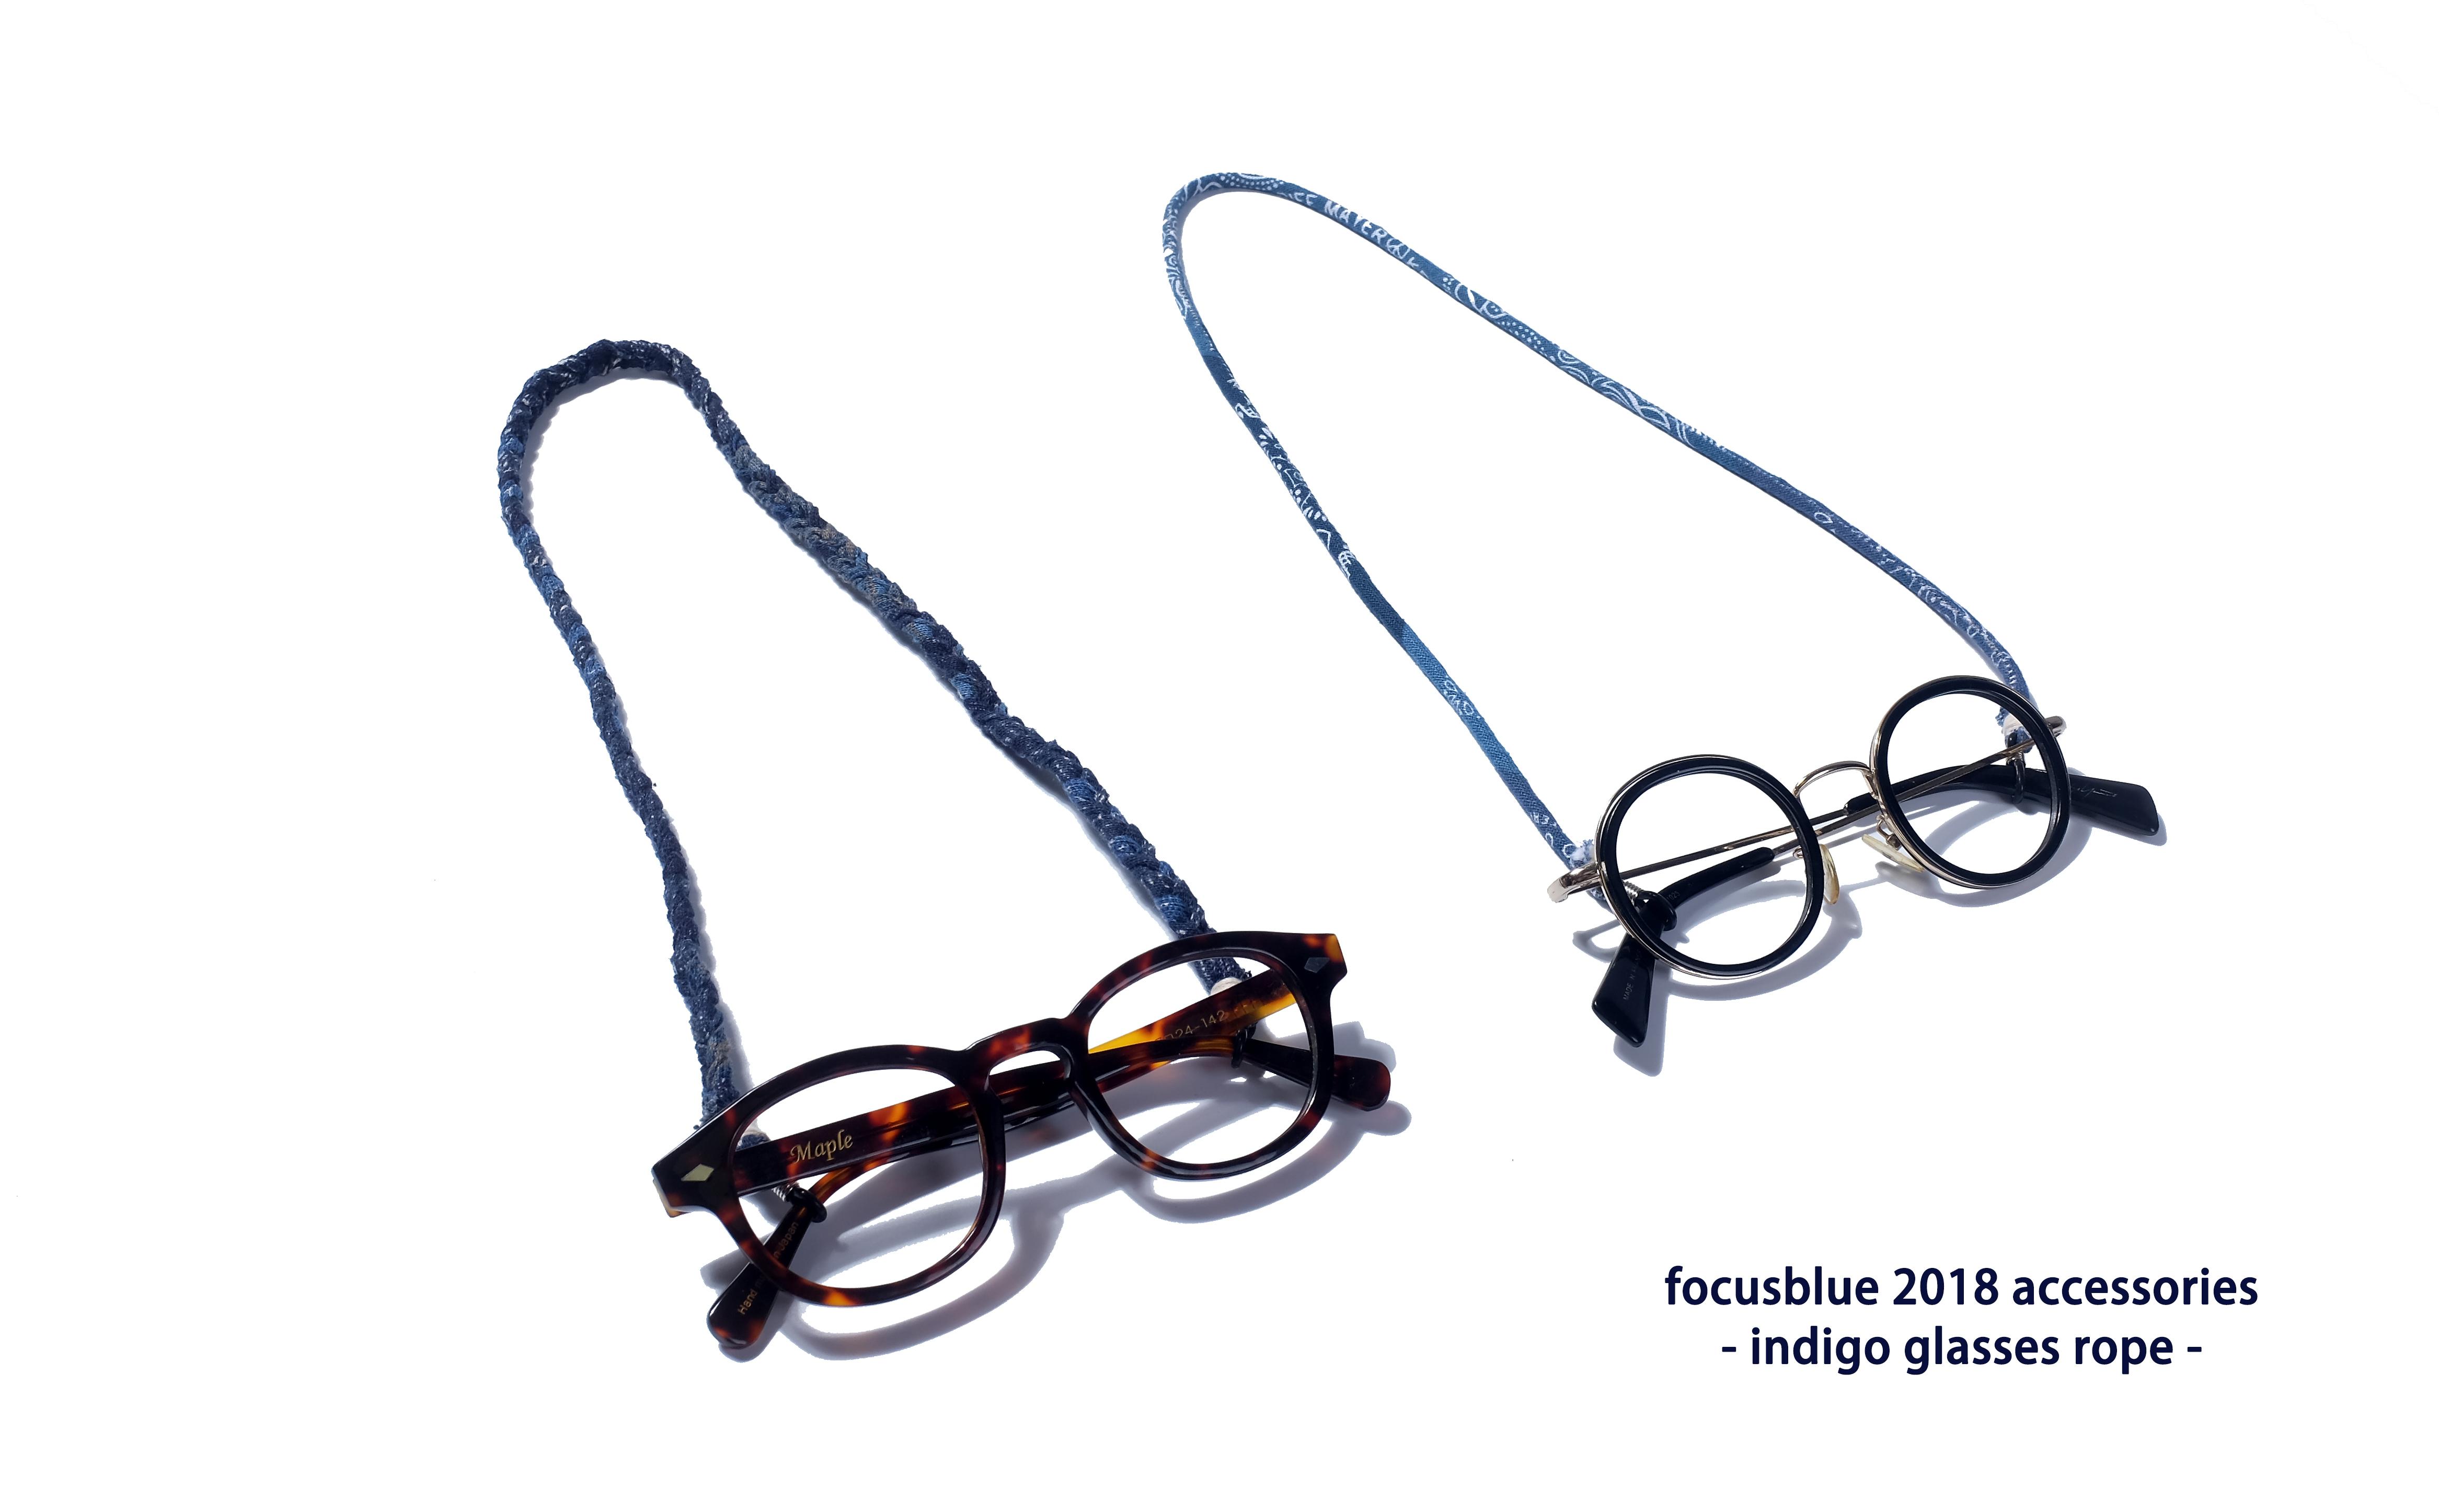 focusblue复古日系森系靛蓝染古布眼镜绳链条项链 挂绳 防丢 挂脖